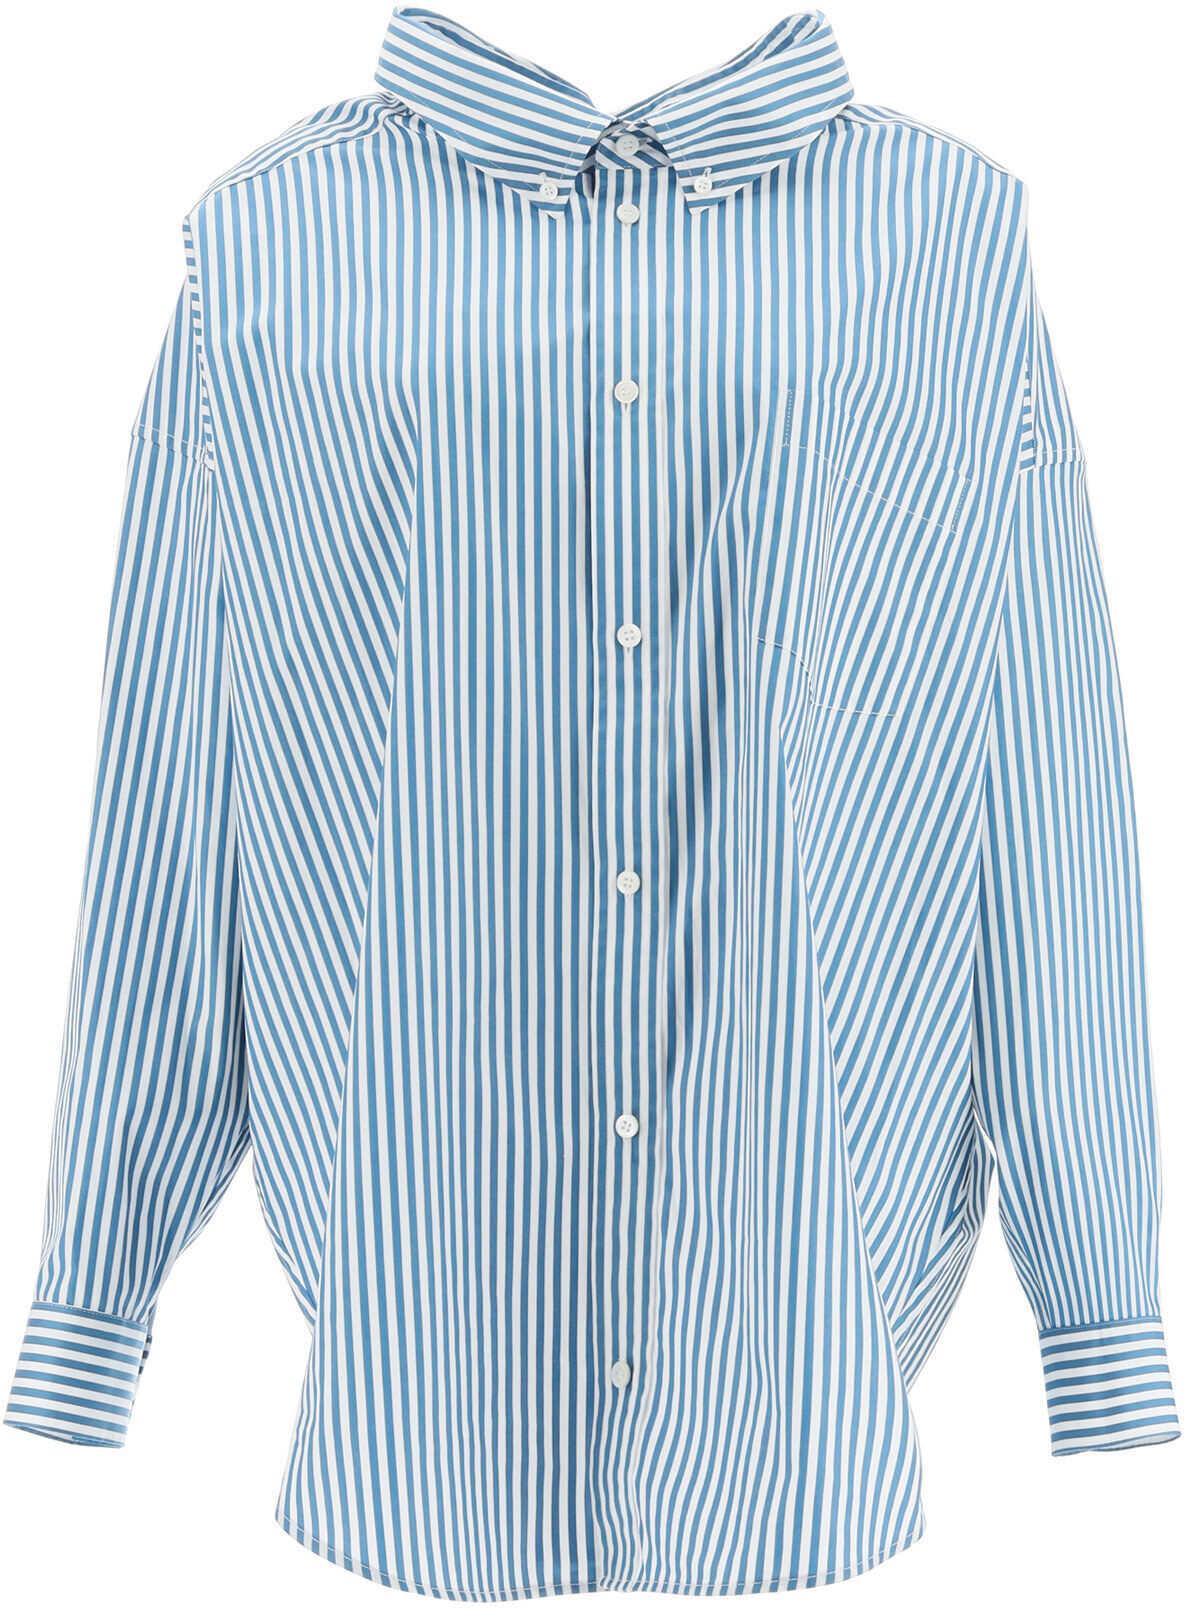 Balenciaga Maxi Swing Shirt With Logo 622050 TIM17 PETROL BLUE WHITE image0